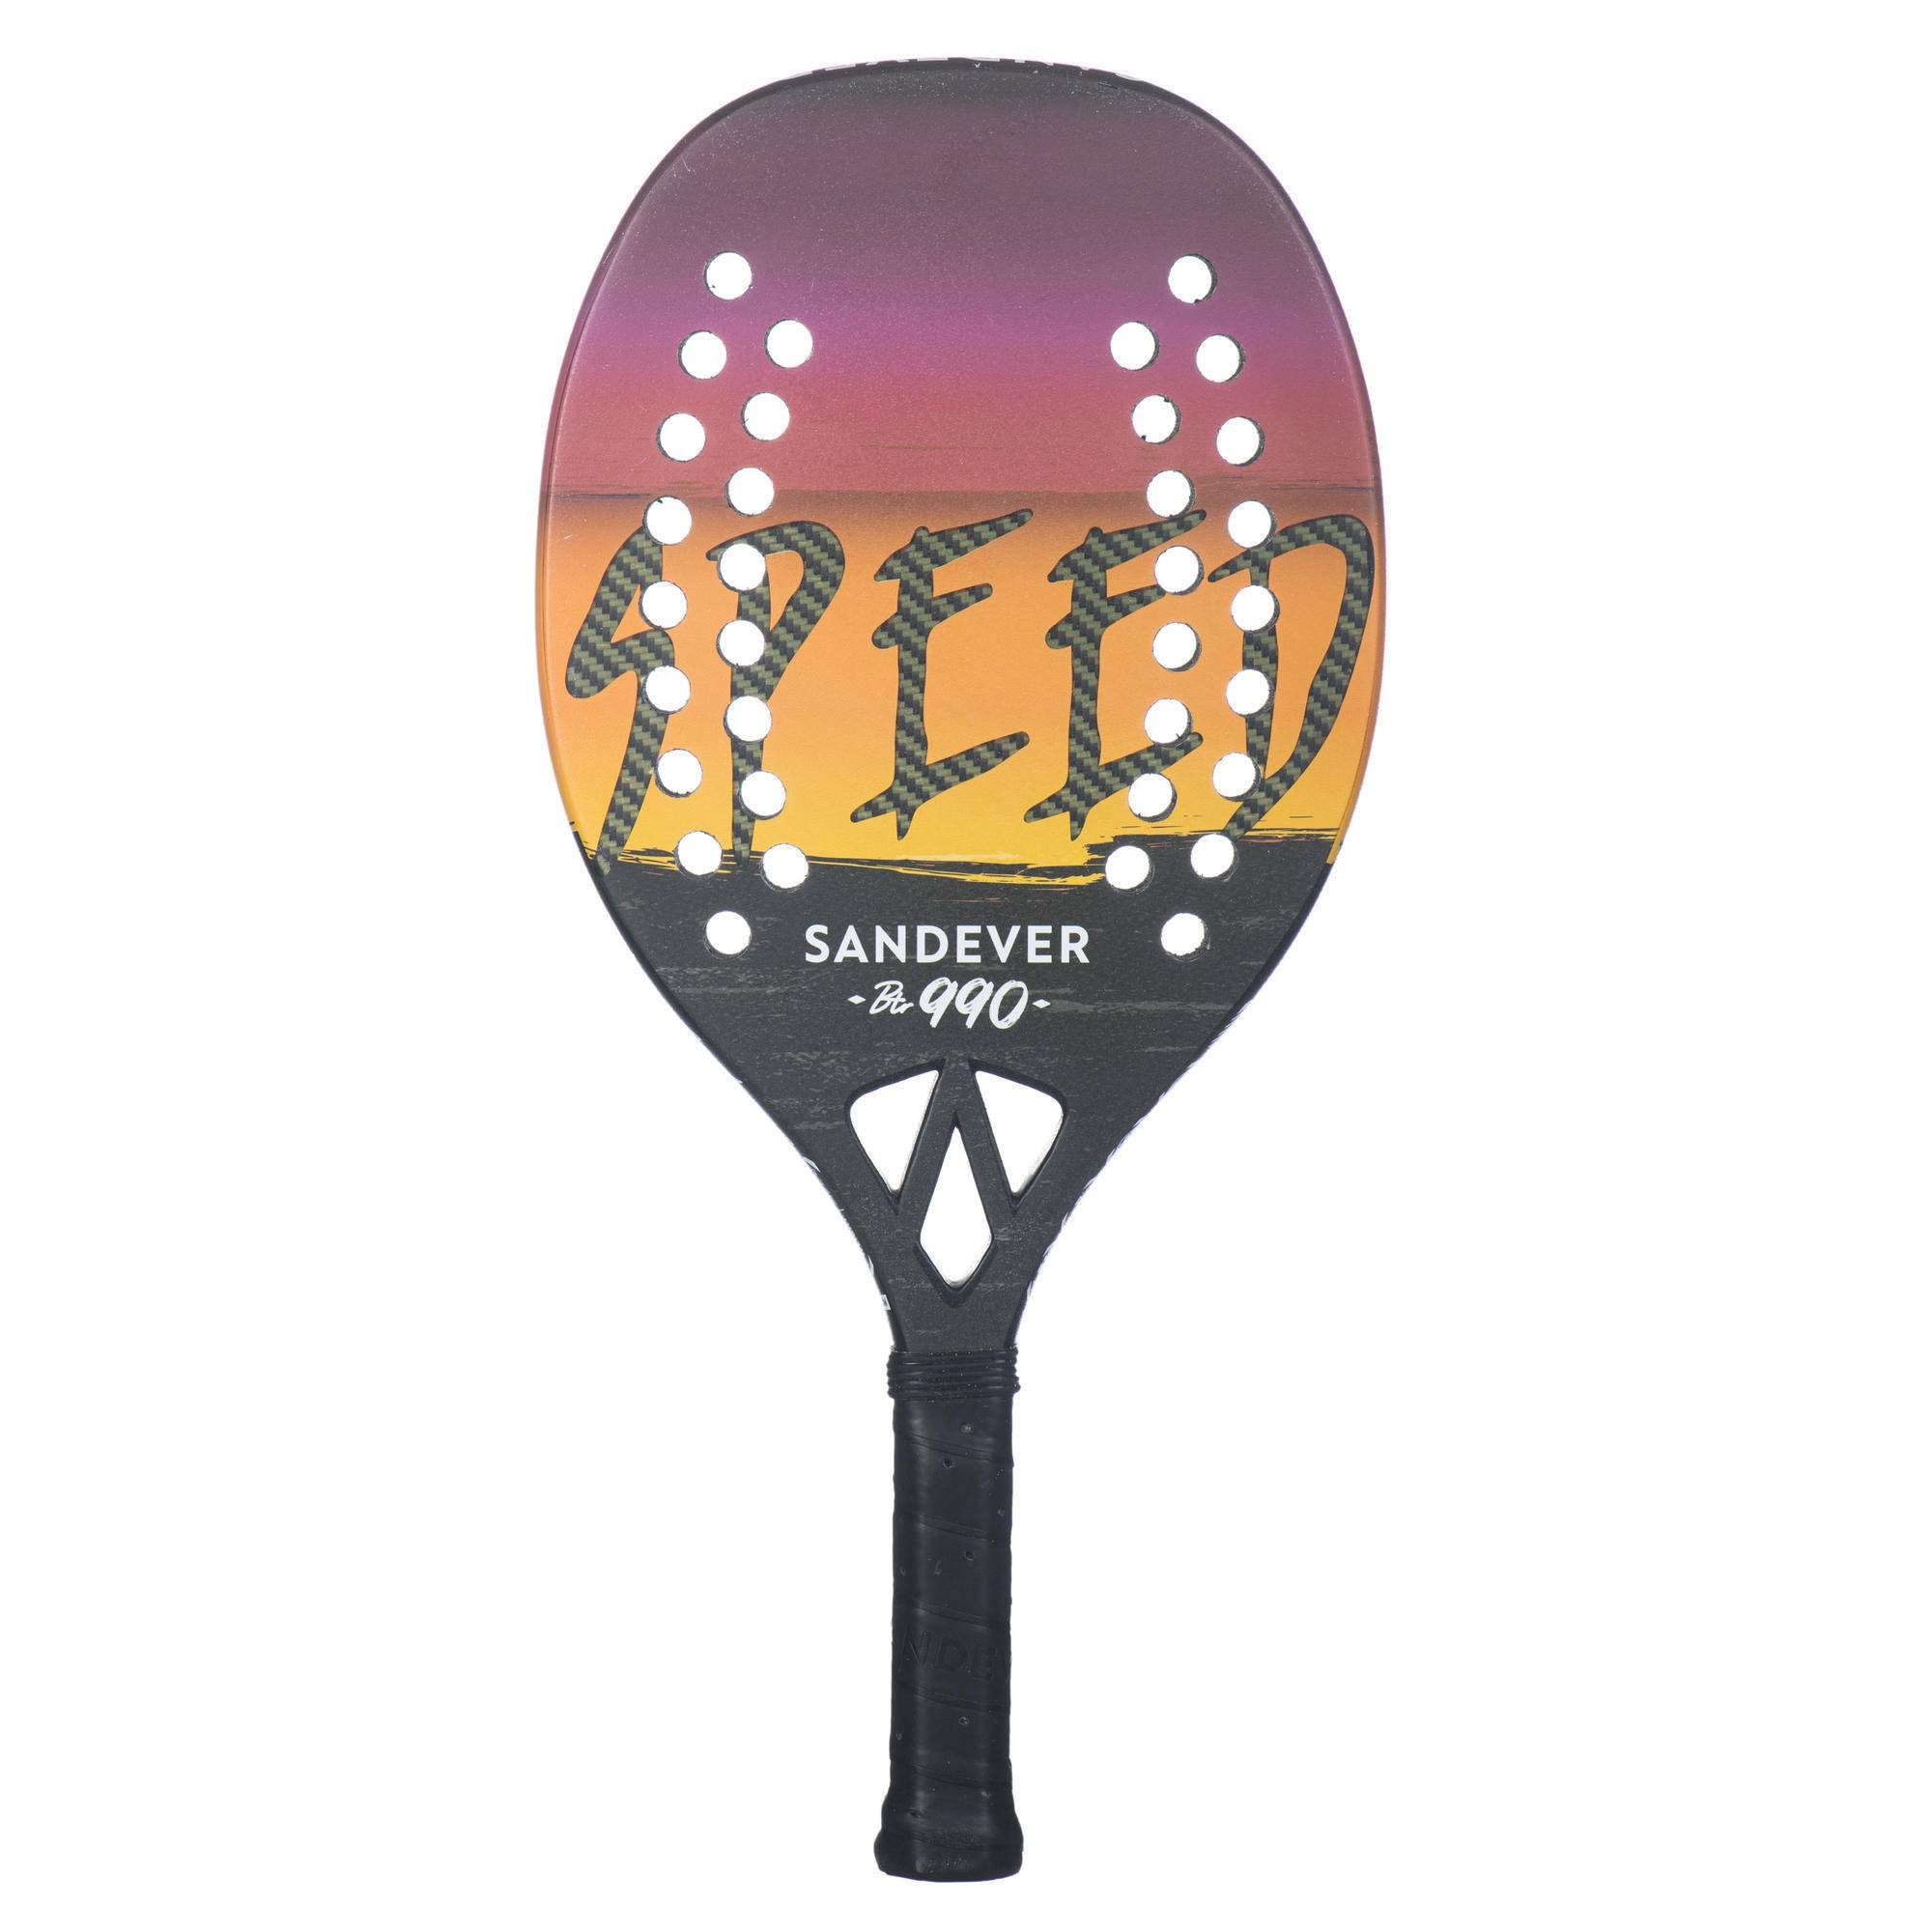 Sandever raquette de beach tennis BTR 990 Speed - Sandever